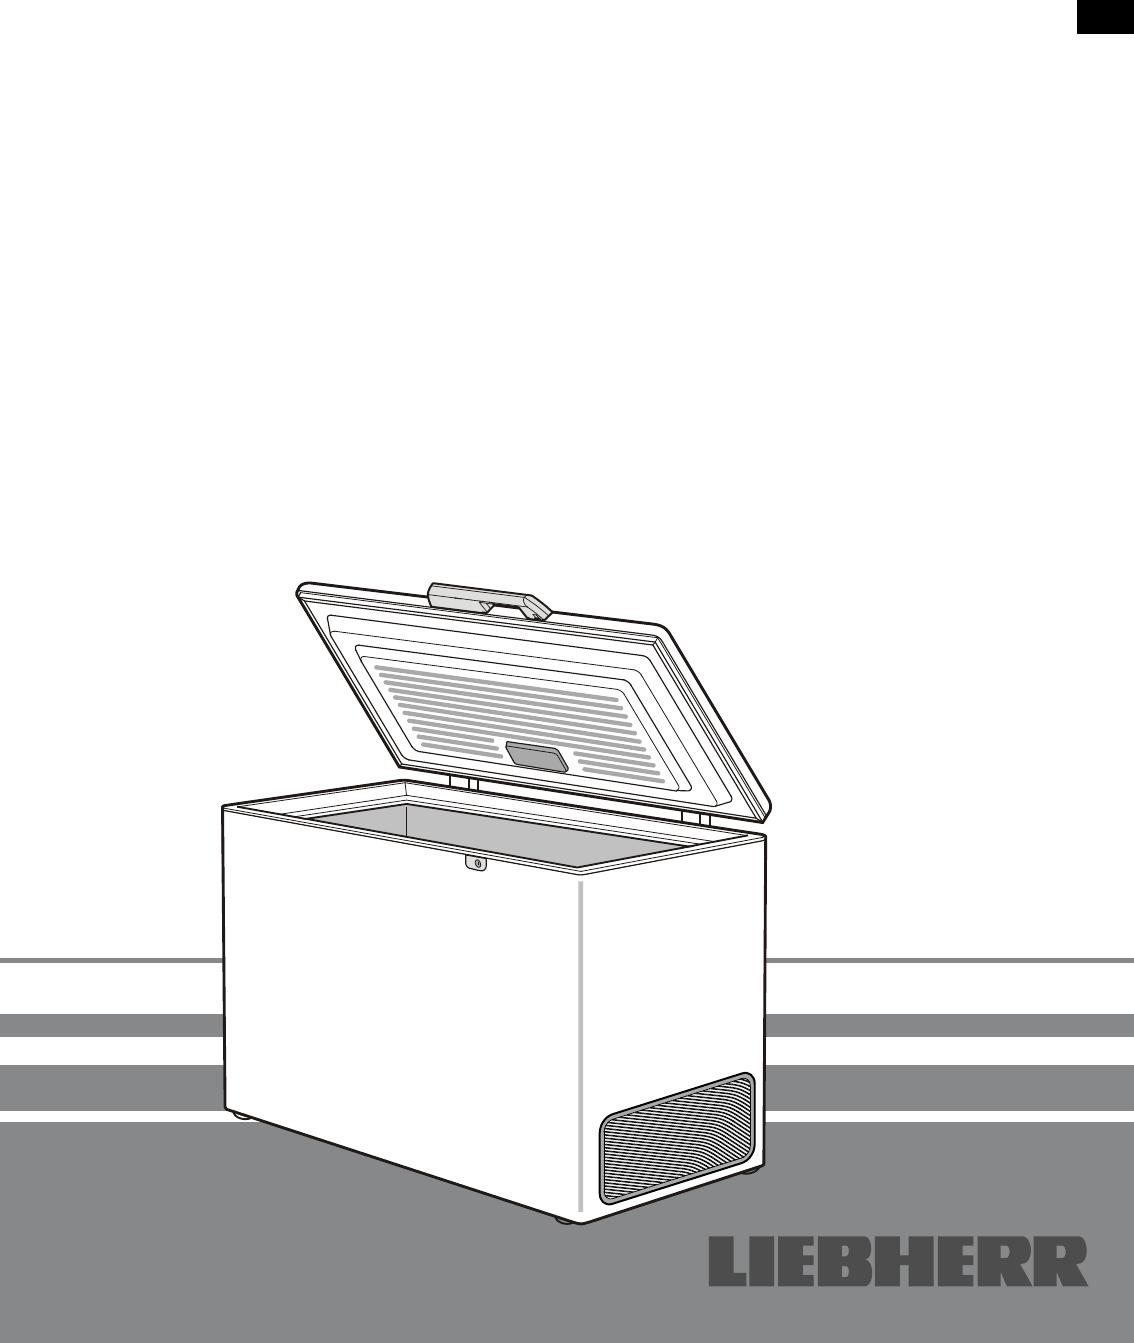 handleiding liebherr gtp 2356 premium pagina 1 van 7. Black Bedroom Furniture Sets. Home Design Ideas